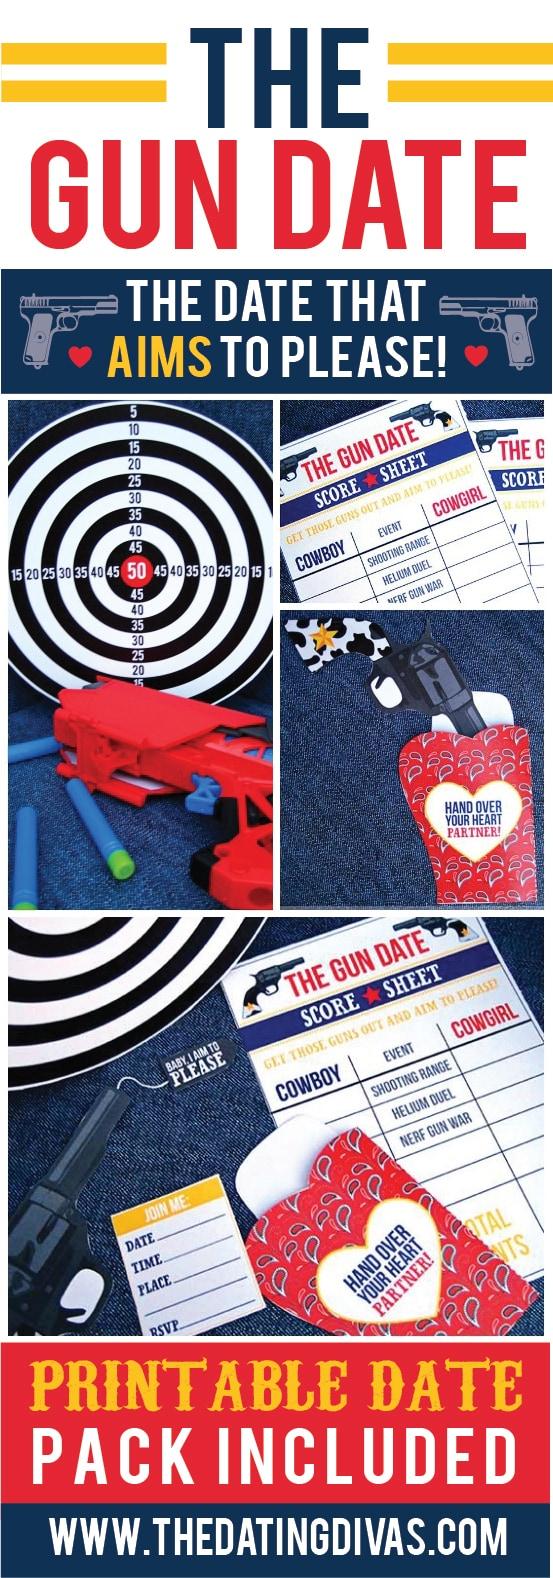 The Shooting Range Date Night